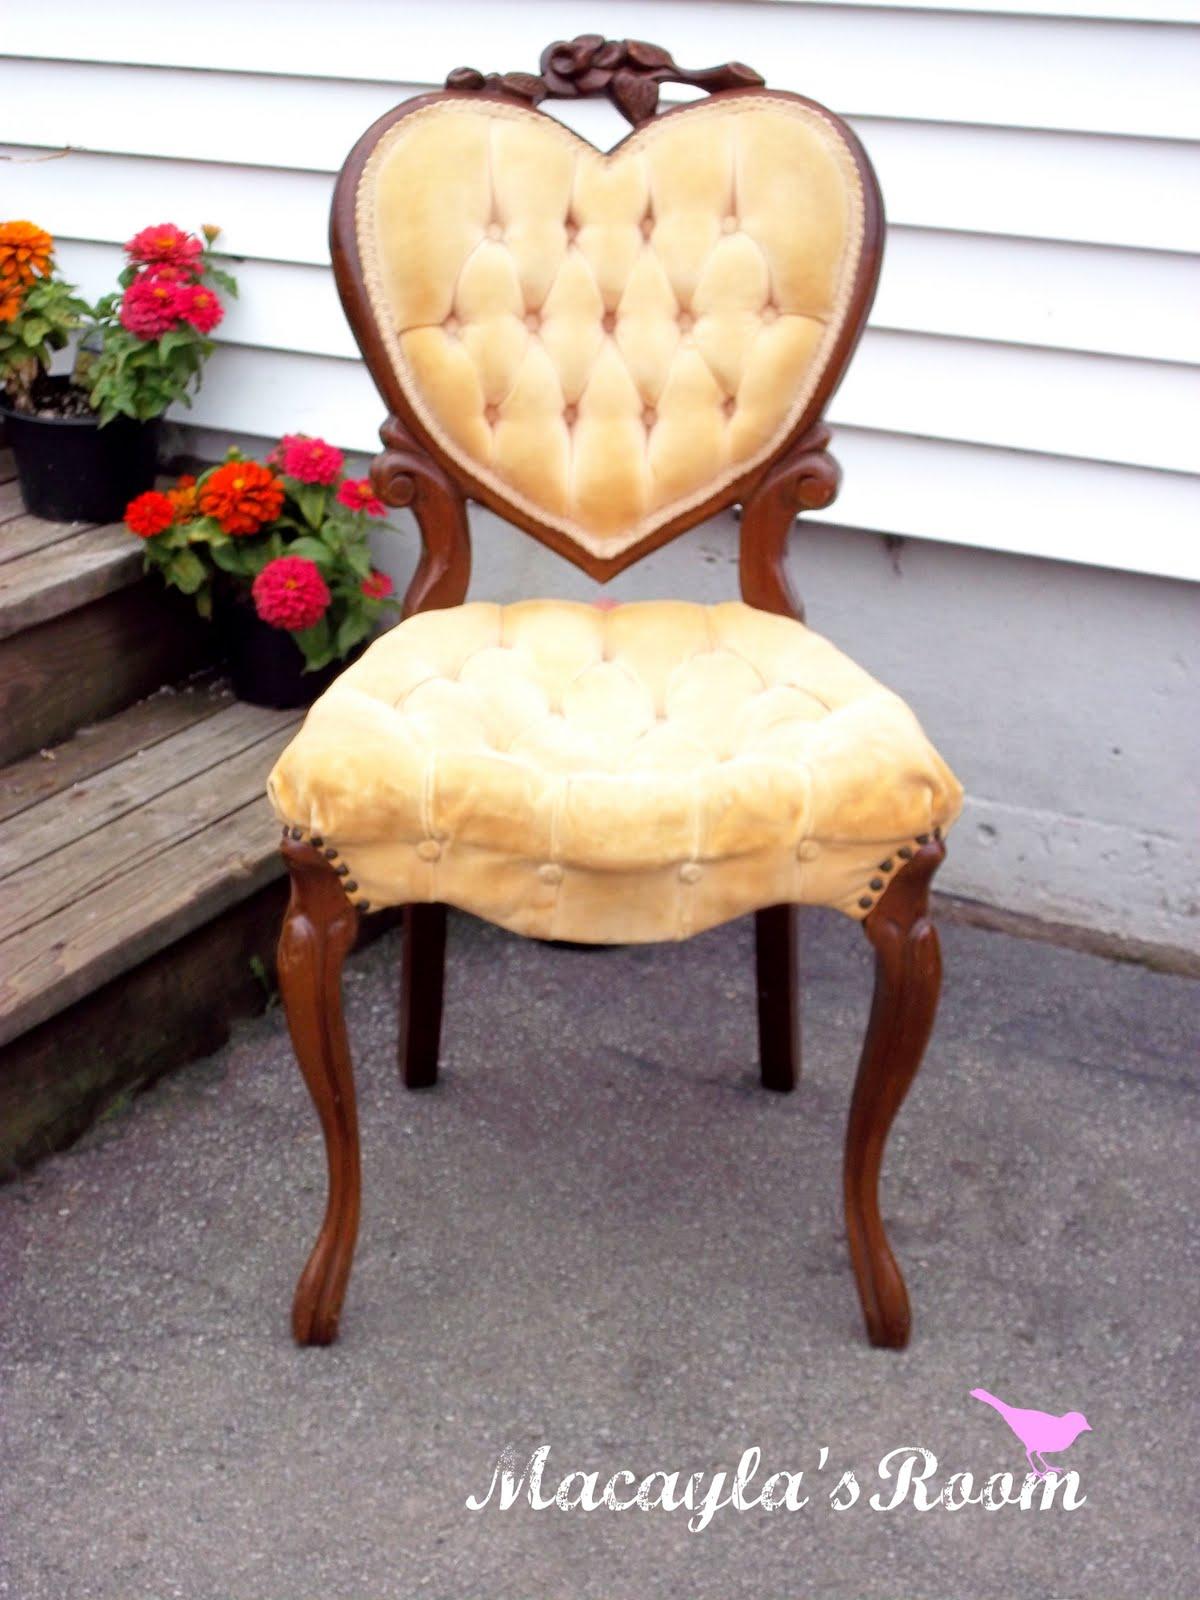 Chair Cover Express Hawaii Swivel Uae Maison Decor A Heart Back